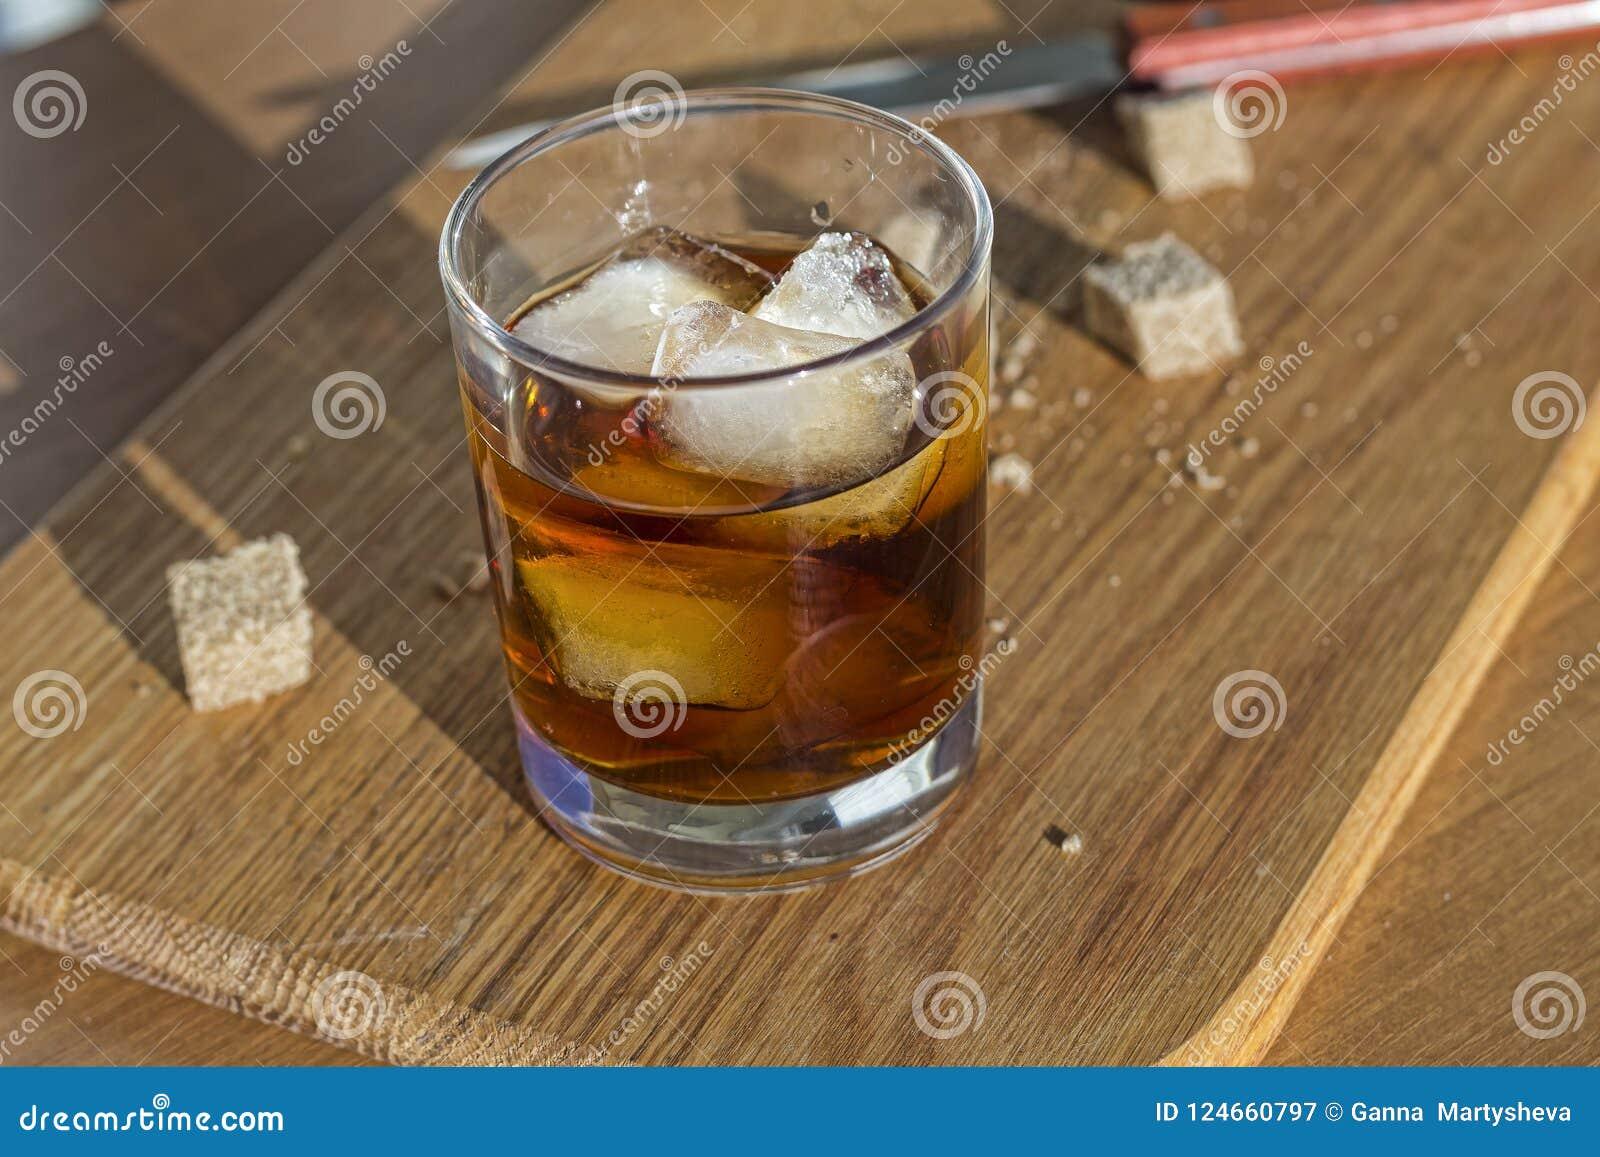 Uba Libre, bruine rum, famouse Cubaanse cocktail, smakelijke kalk